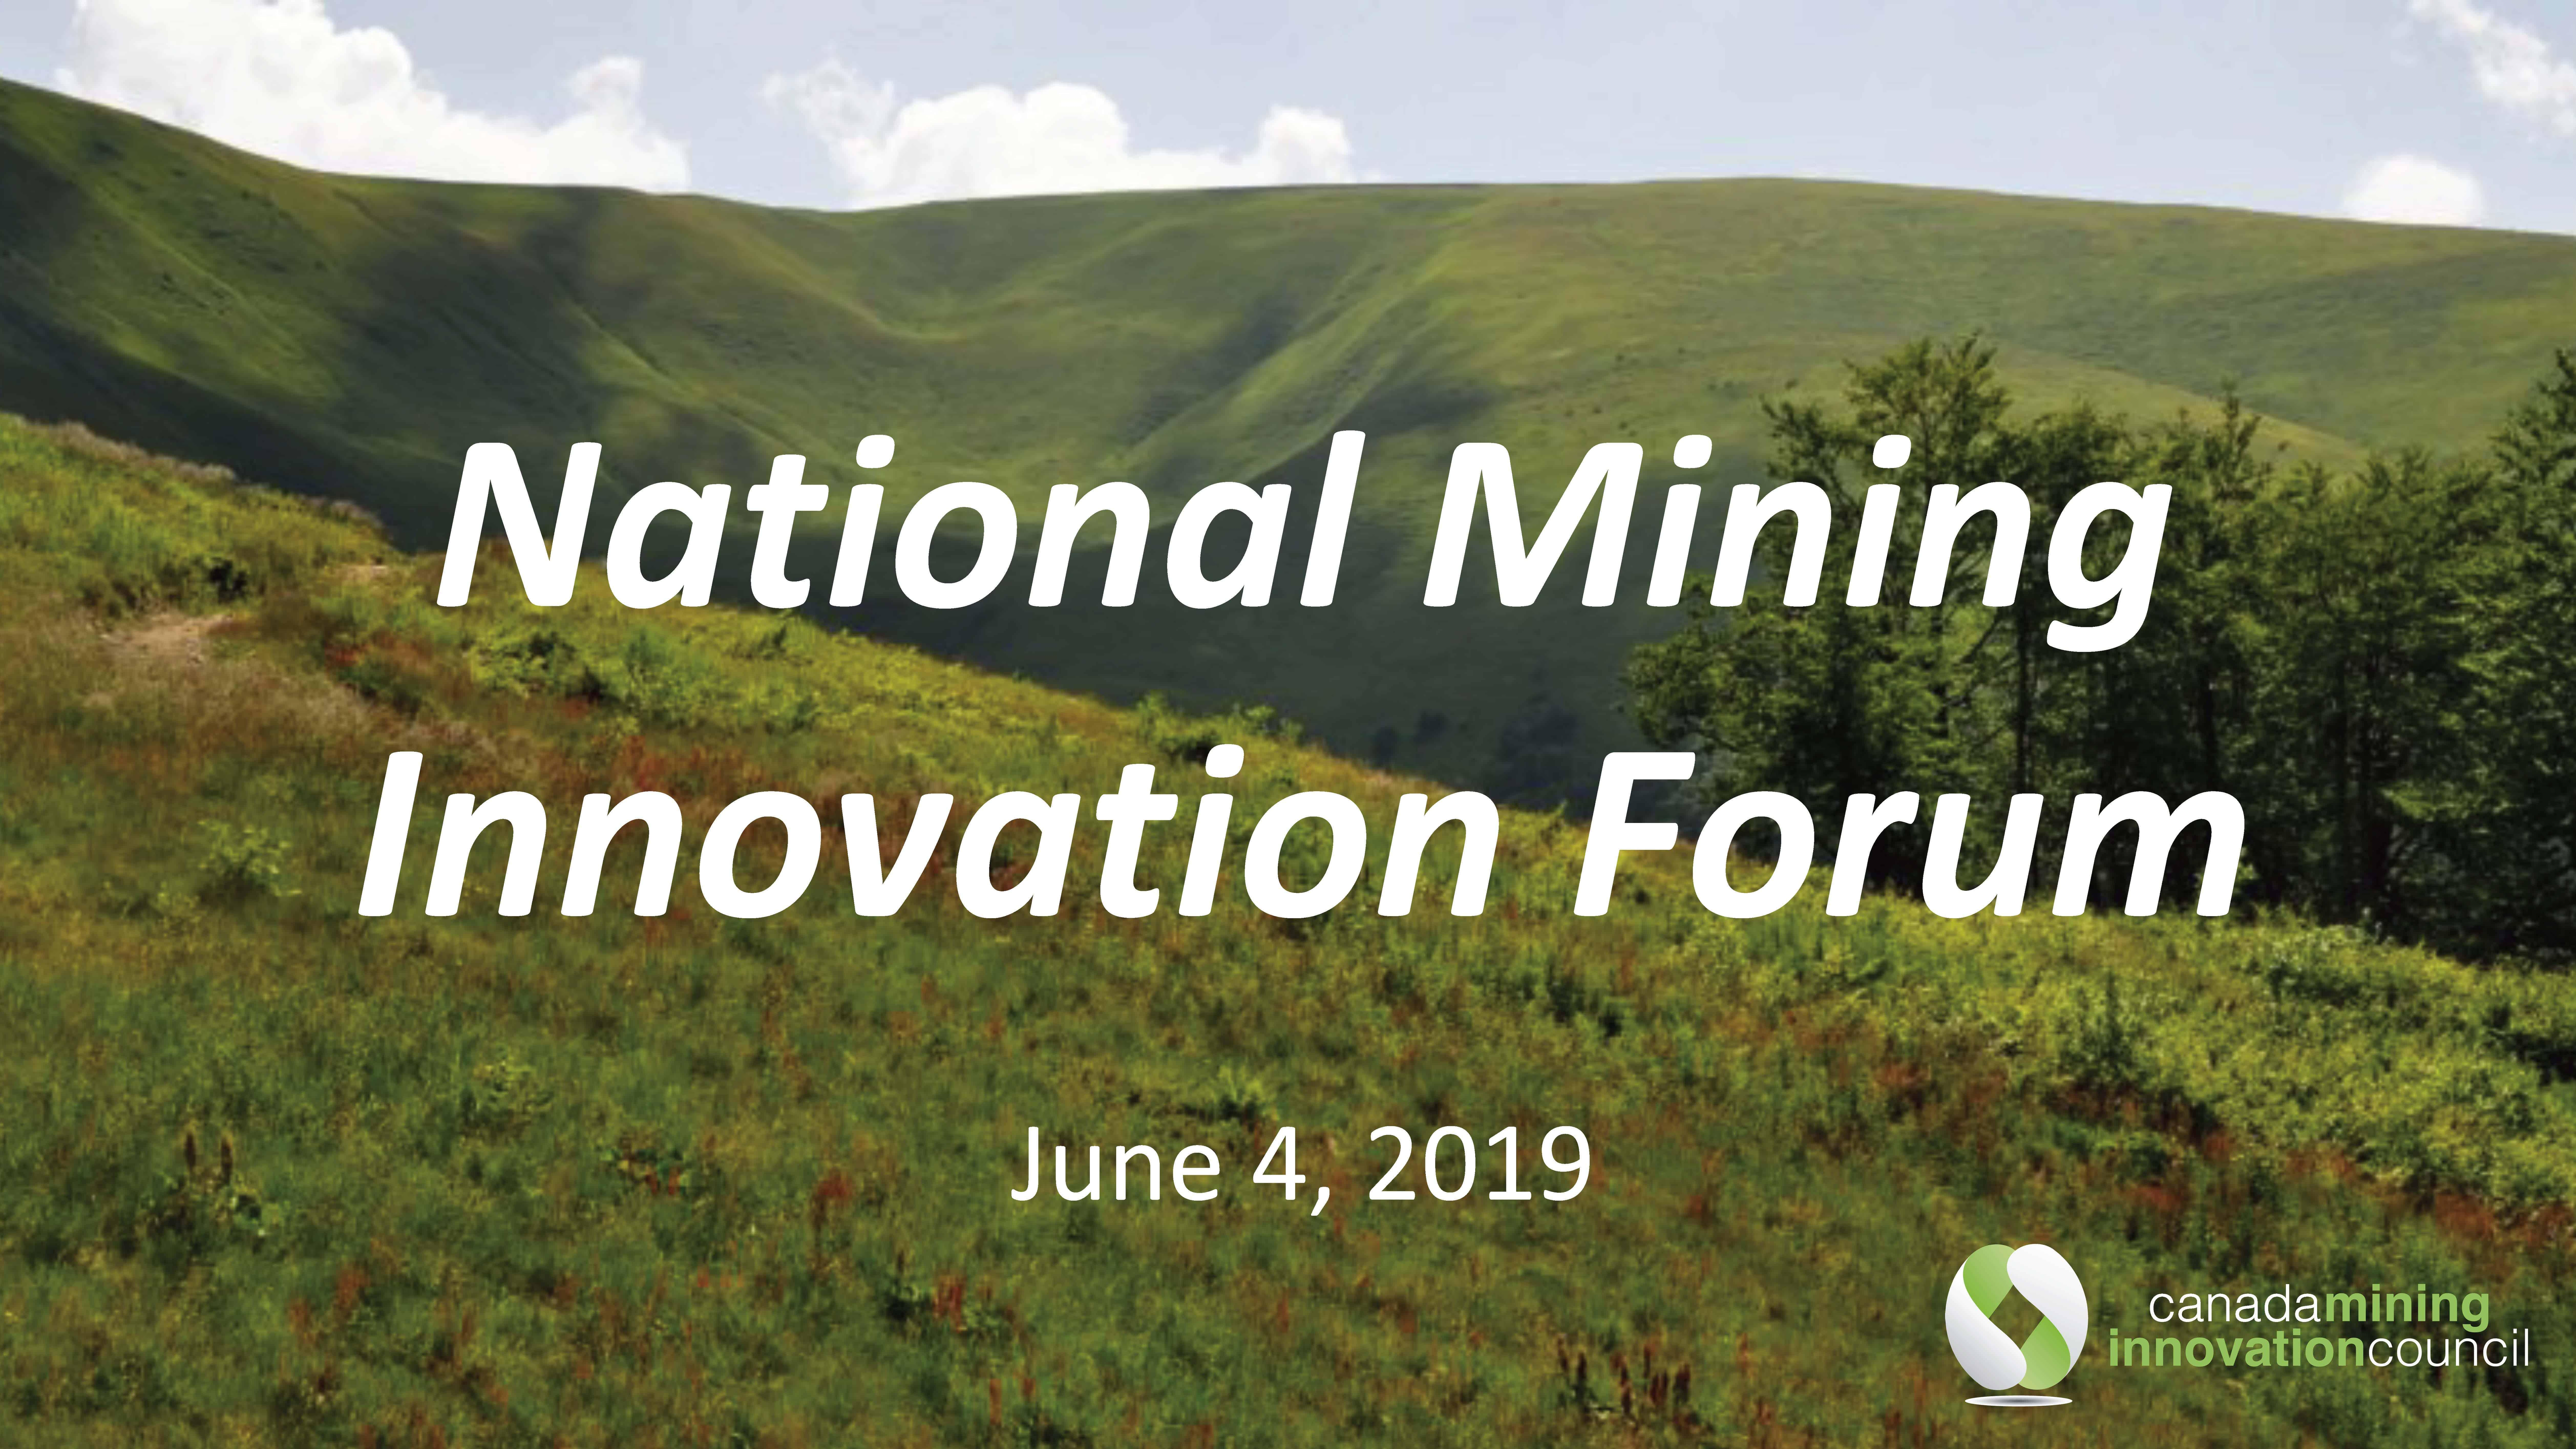 National Mining Innovation Forum title slide